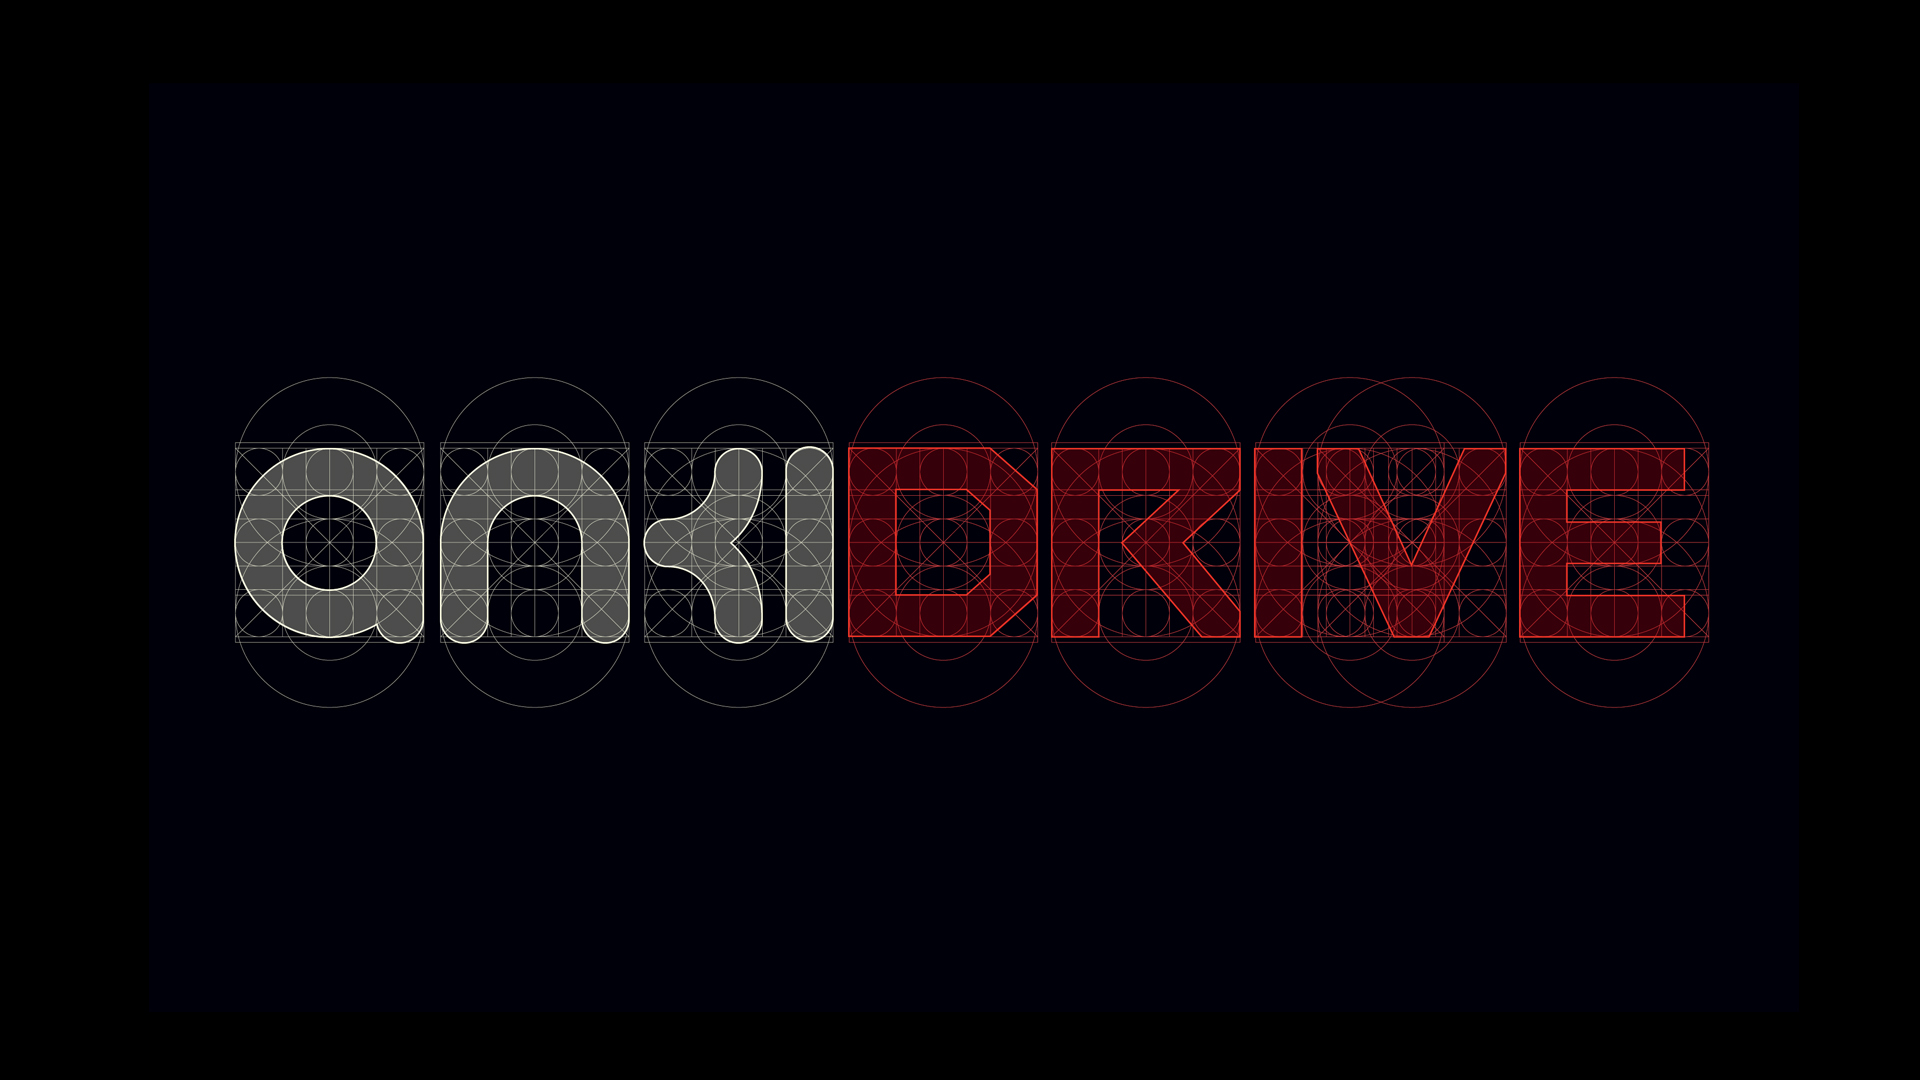 ankidrive_1.jpg